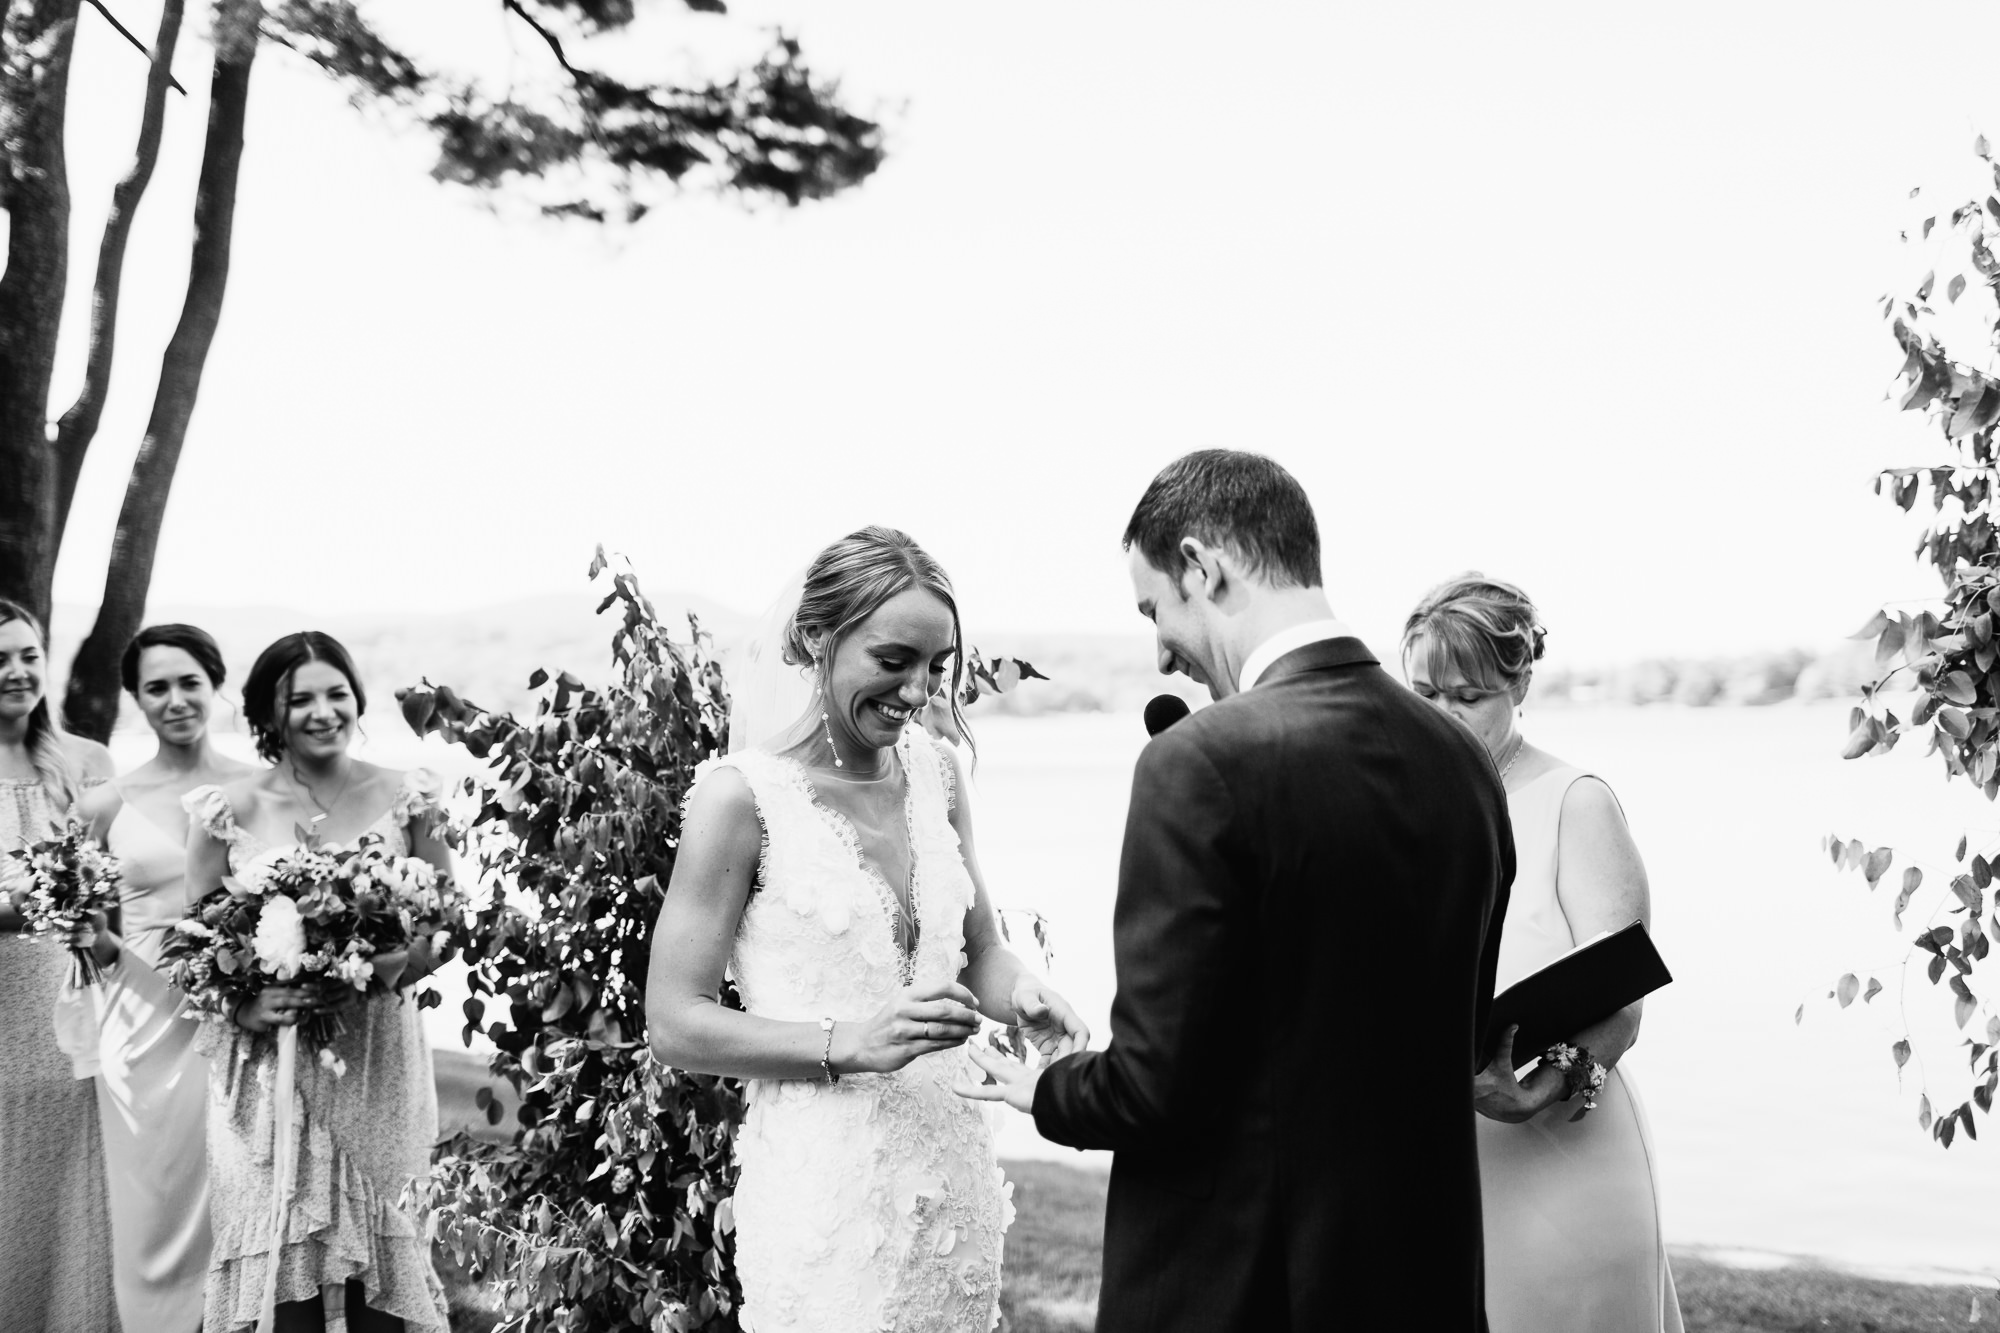 connecticut-summer-lake-wedding-emily-kirke-photography-upstyle (98 of 181).jpg